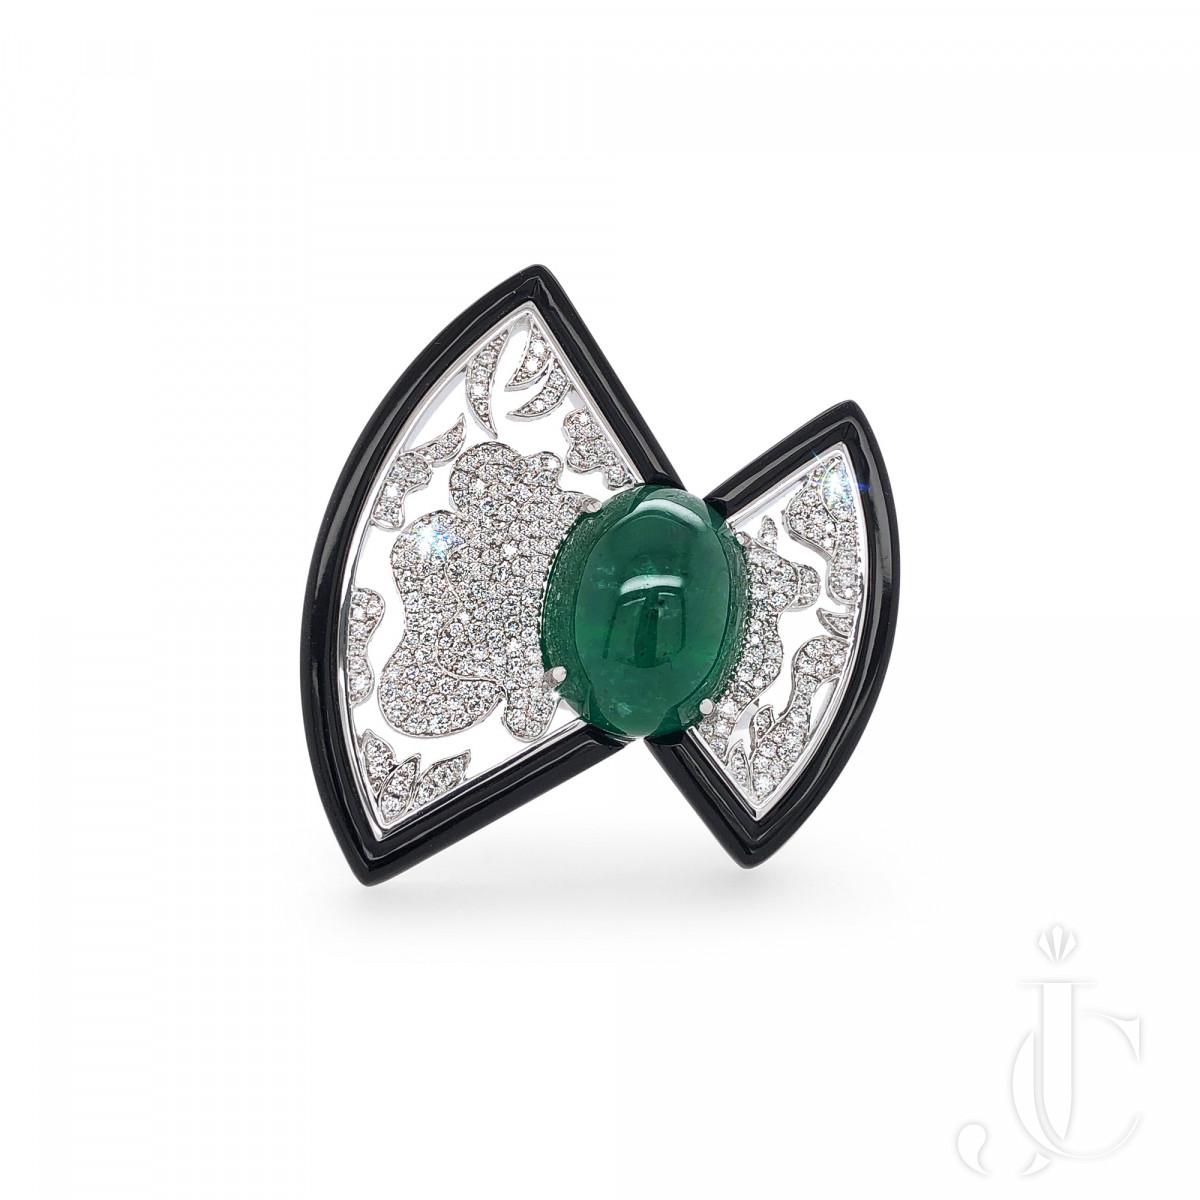 An Order of Bling Emerald, Diamond & Onyx Ring, 18 Karat Gold